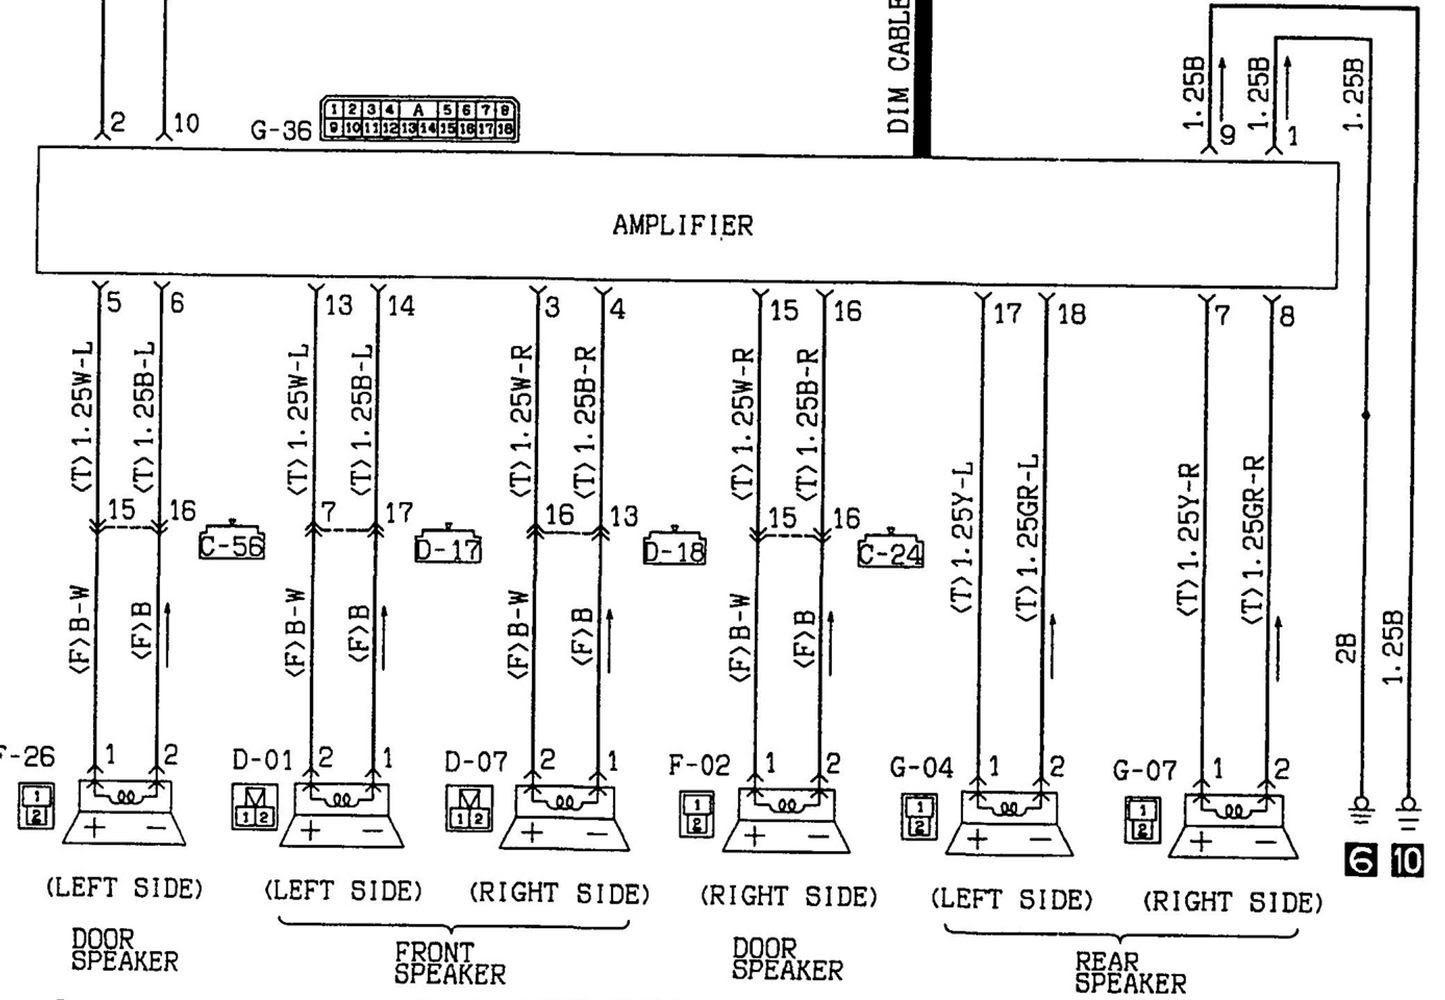 2000 Mitsubishi Eclipse Clutch Diagram Wiring Schematic Simplicity Safety Switch Wiring Diagram For Wiring Diagram Schematics